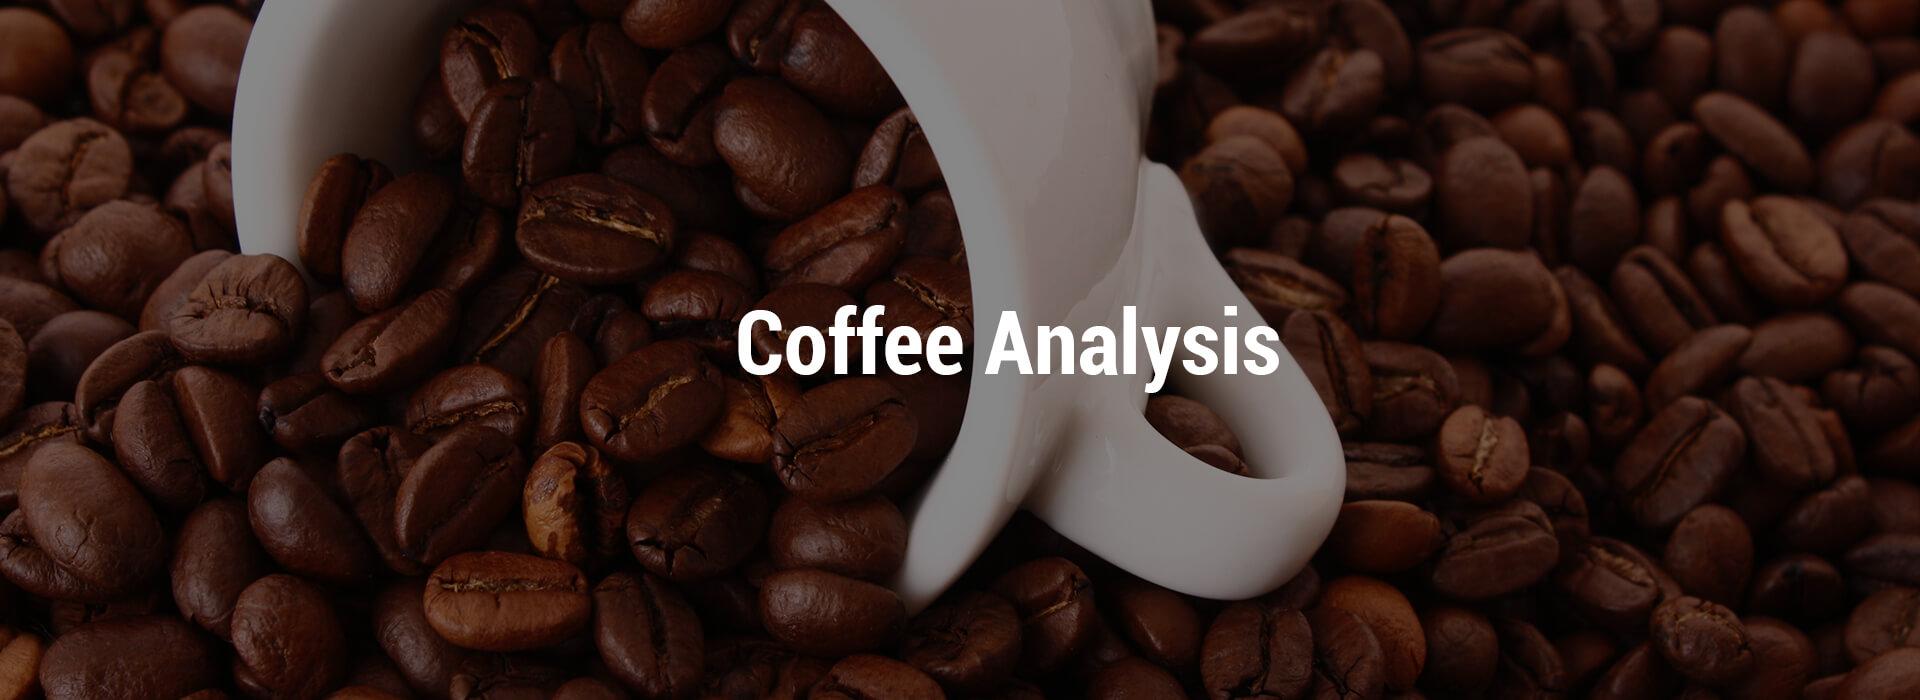 HS-coffee-header